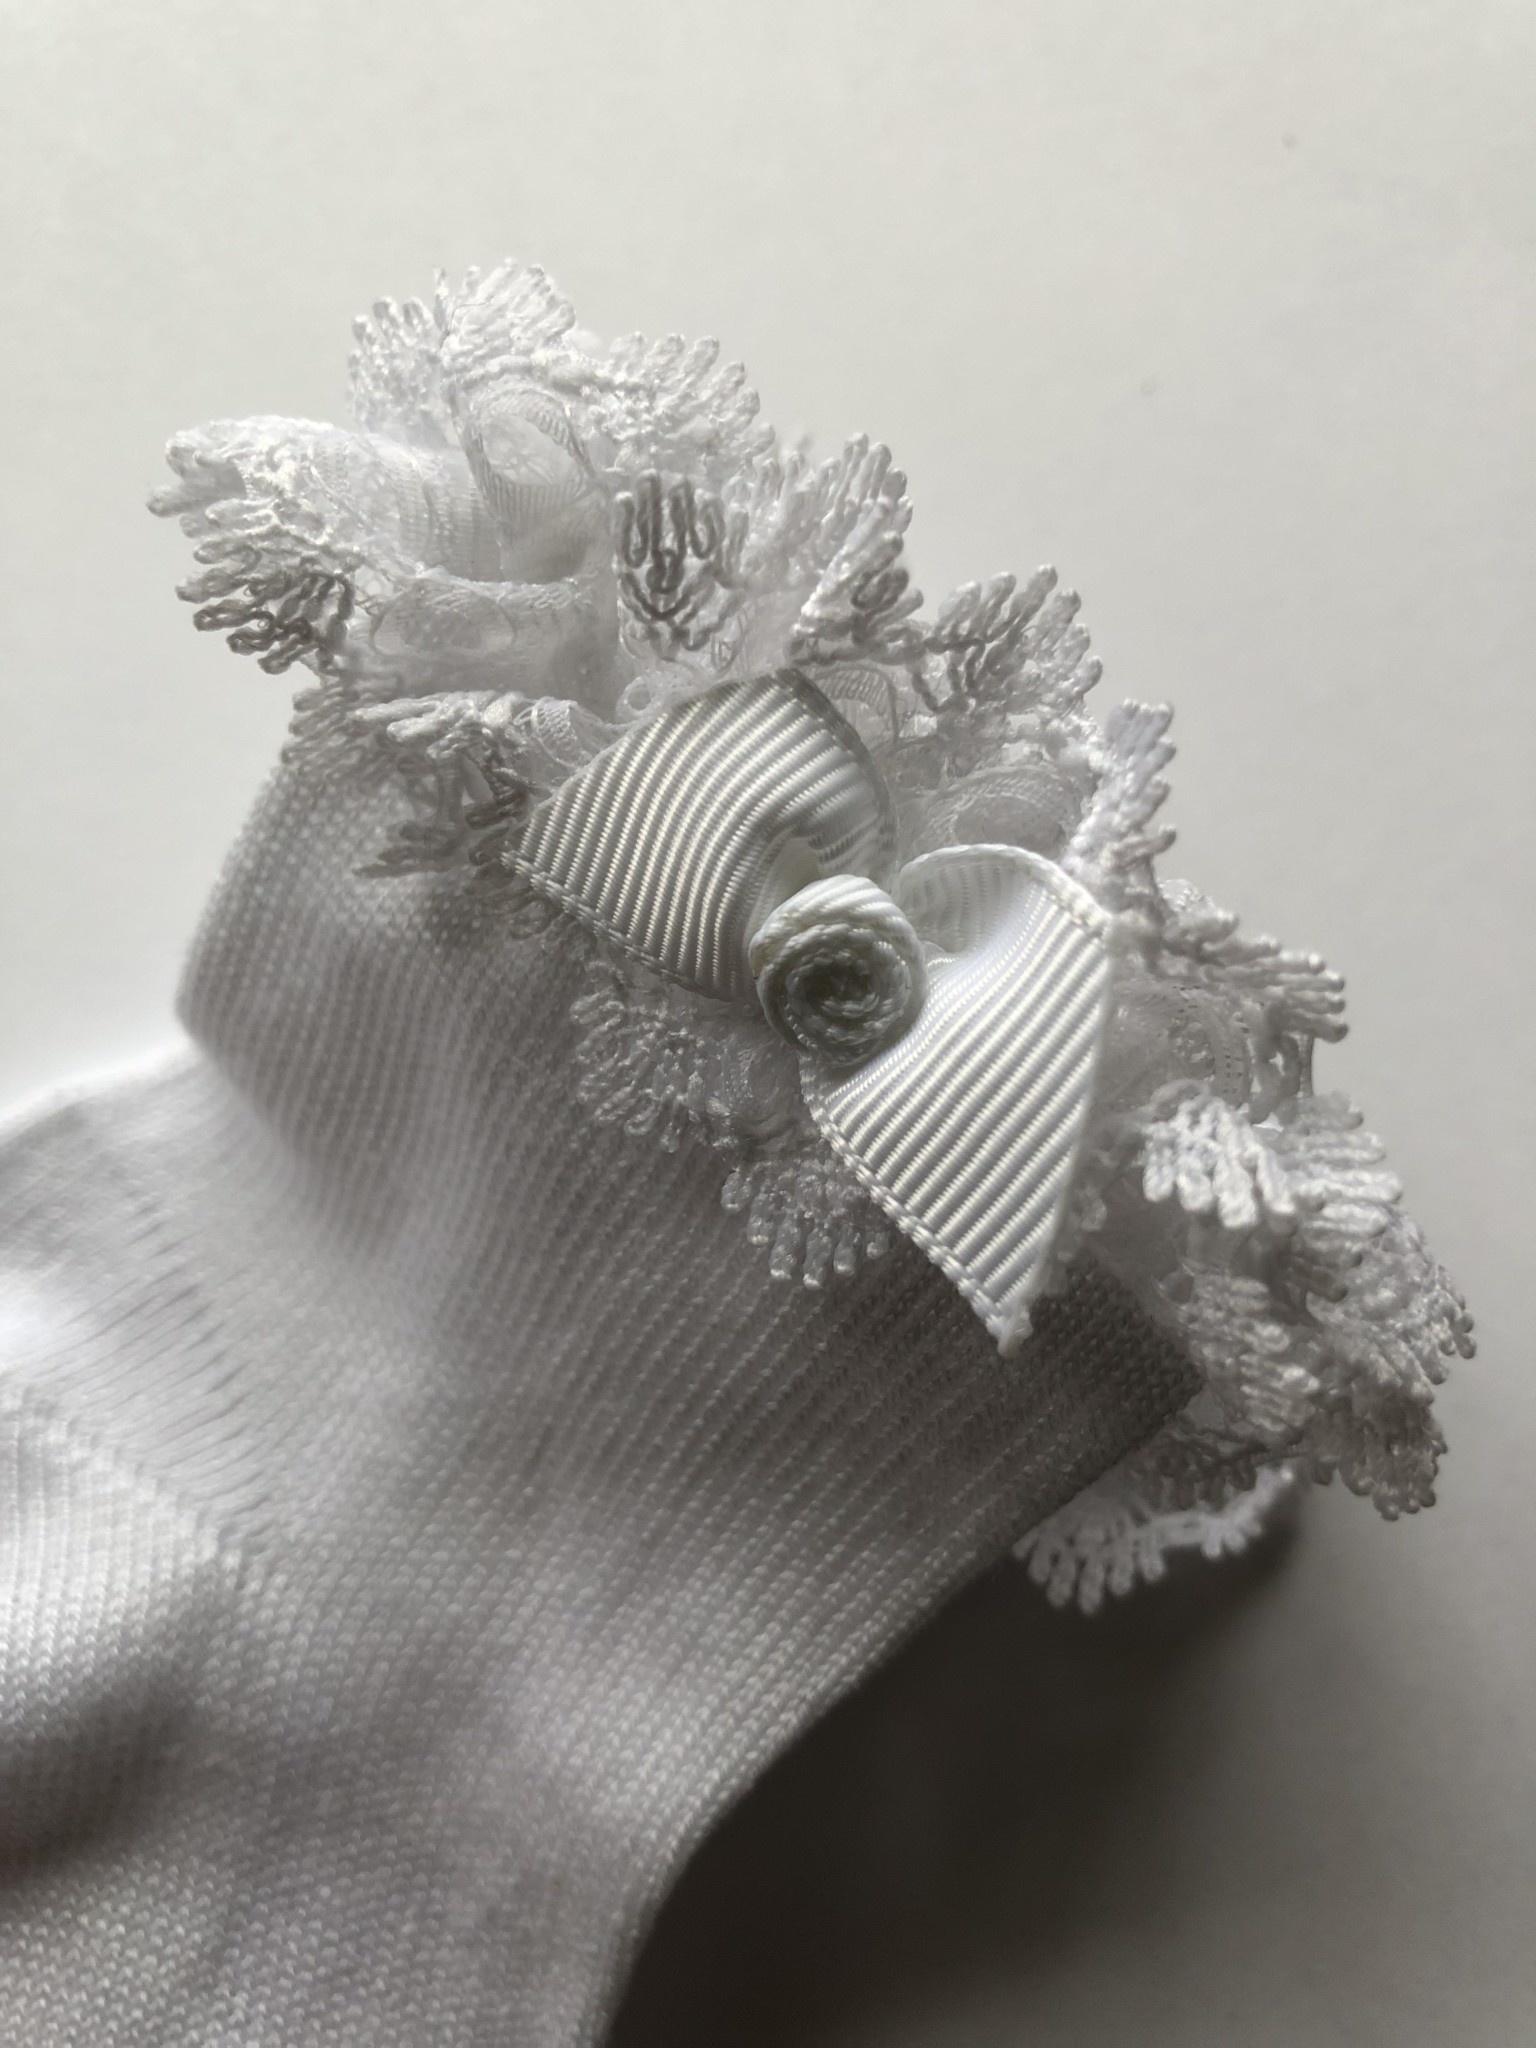 JC Socks JC Socks White Ankle Sock With Short Lace Ruffle & Rose Bow